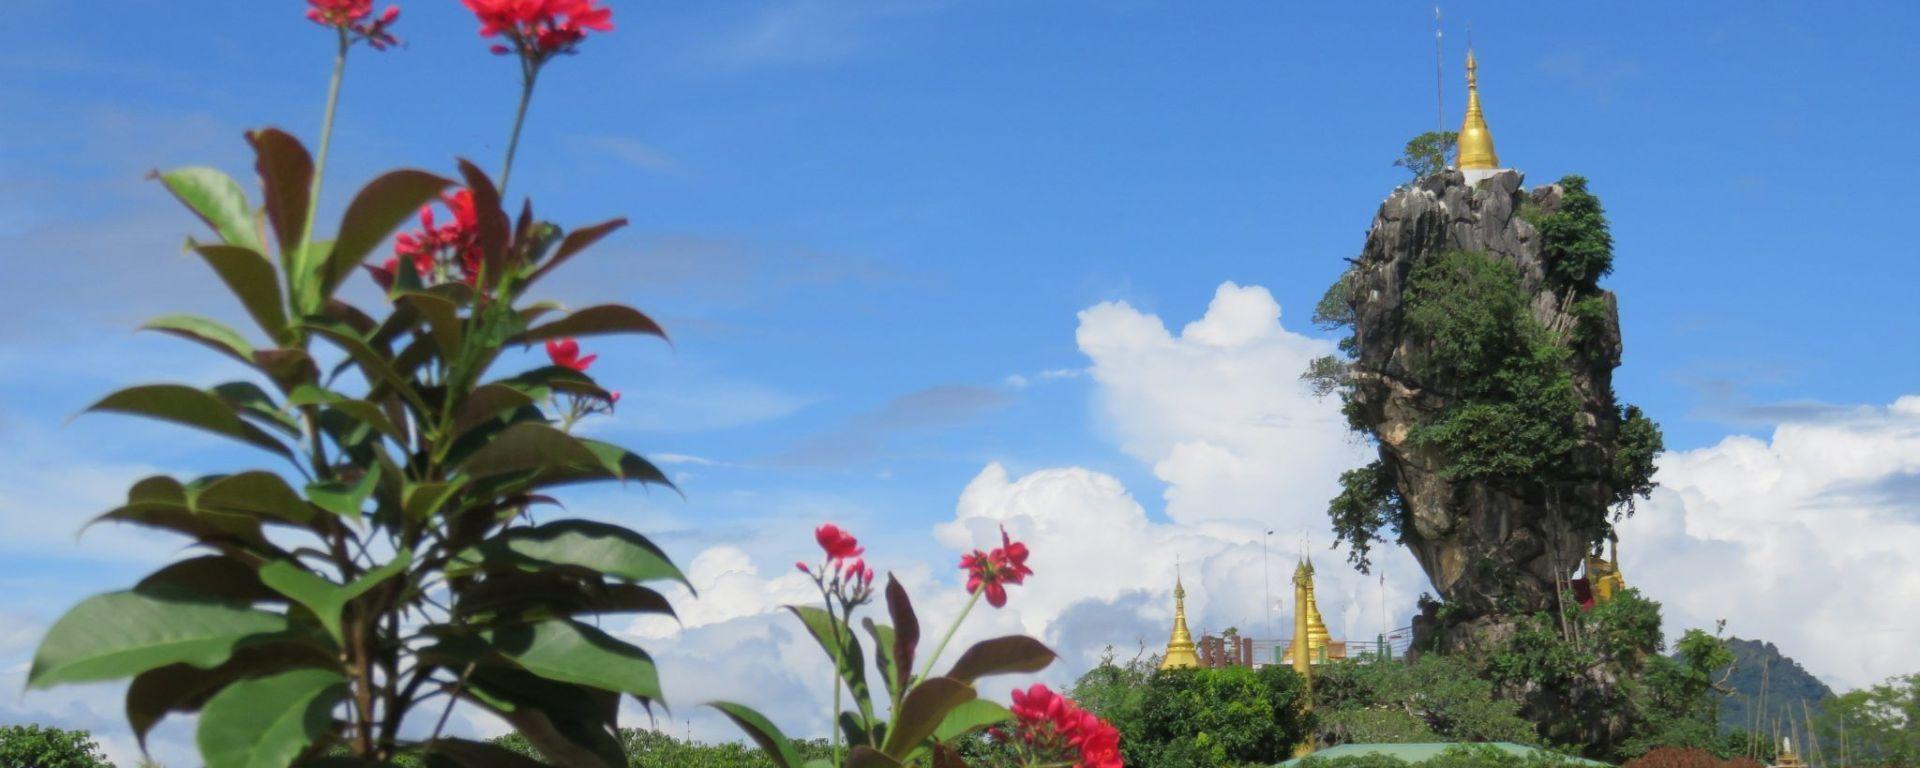 Kyaut Kalat, Hpa An, Myanmar